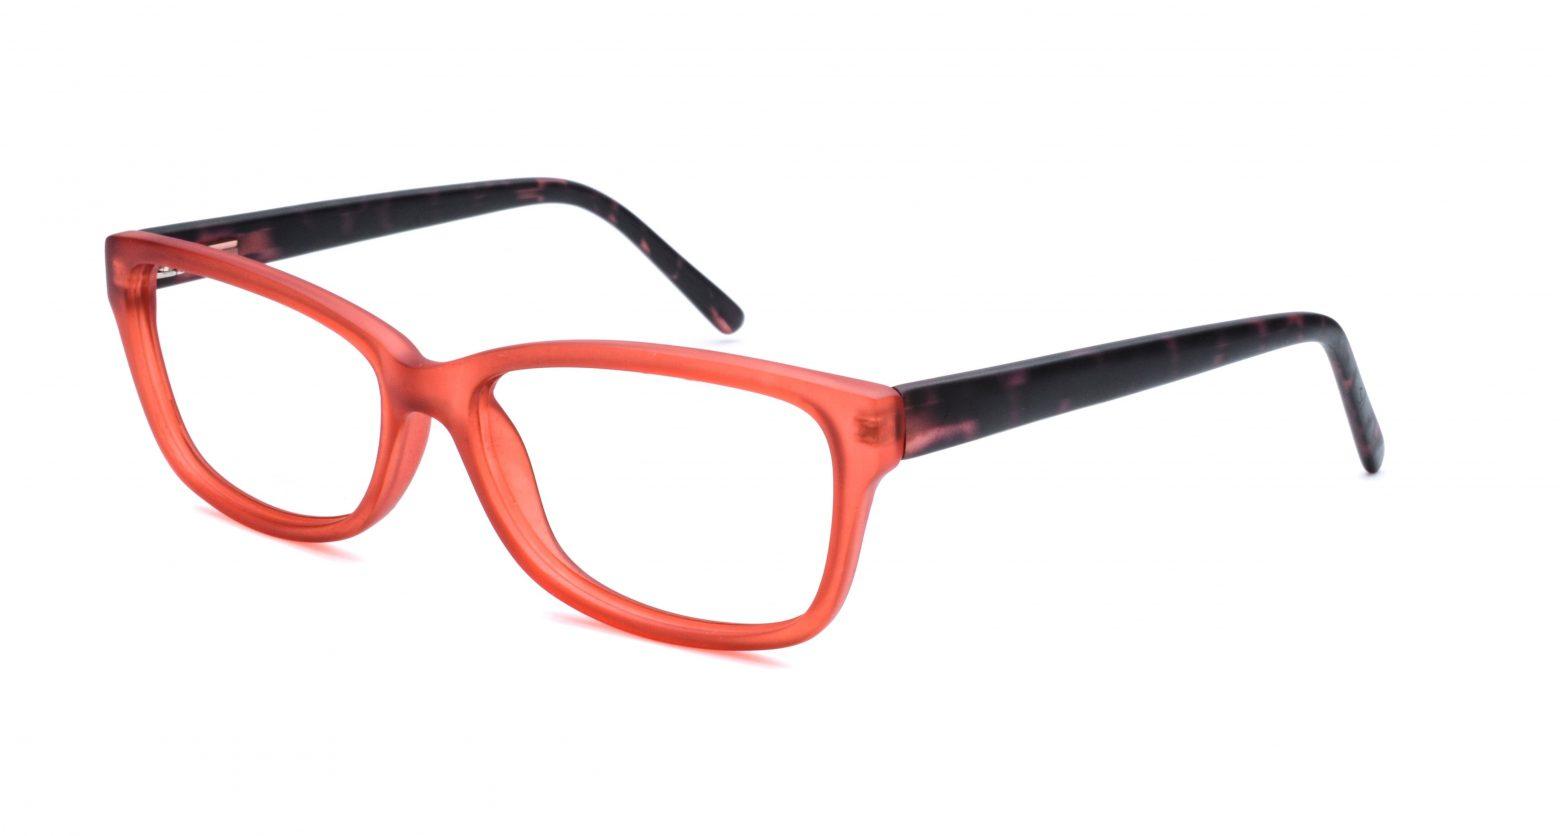 Winter Spree Marvel Optics Prescription Eyeglasses  RA269-1